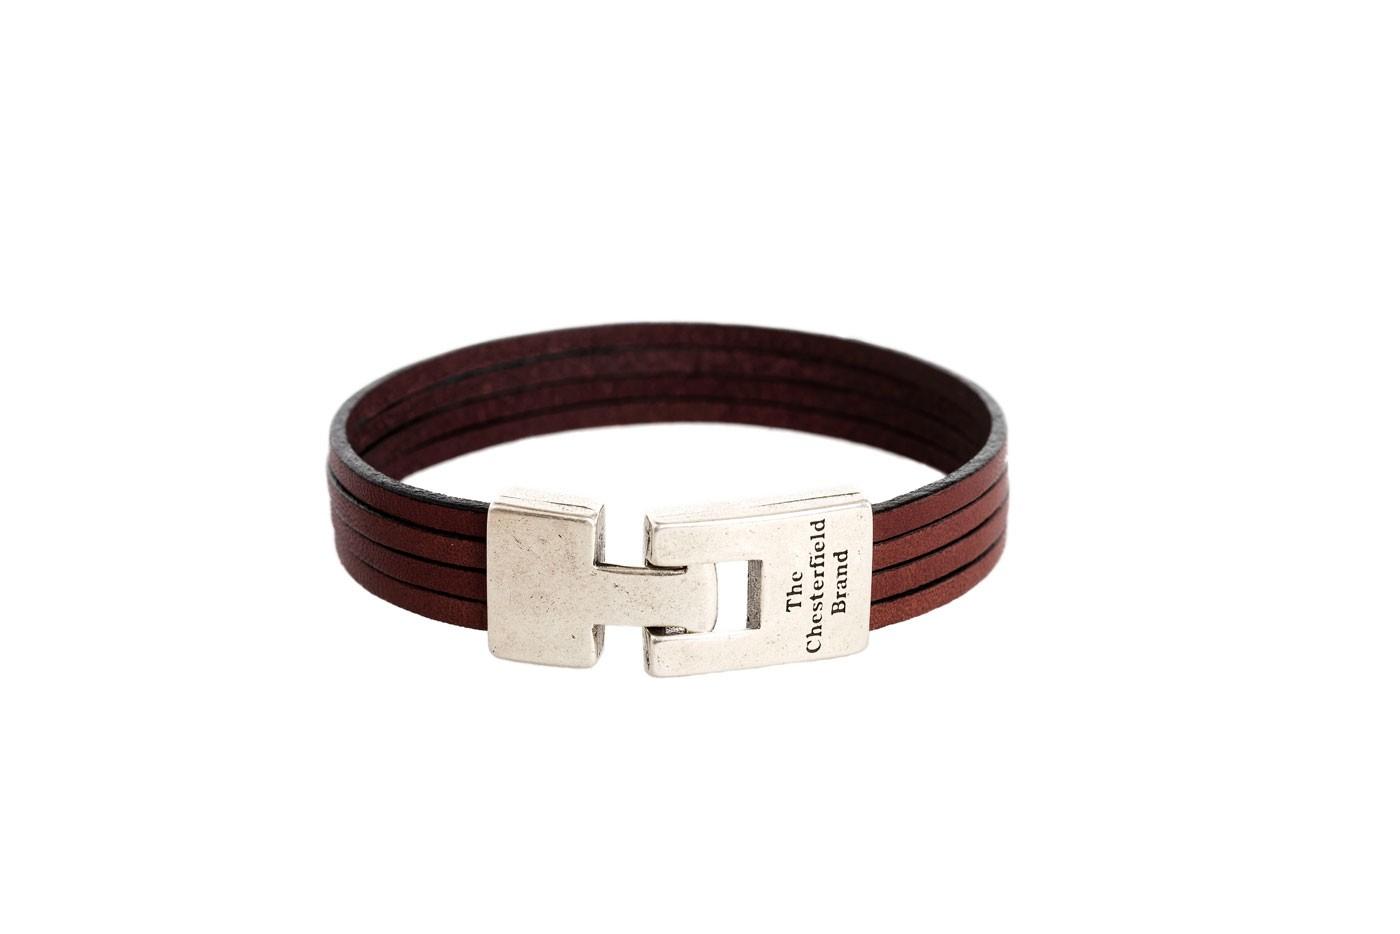 Imagem de Chesterfield Leather Bracelet Brown Katniss